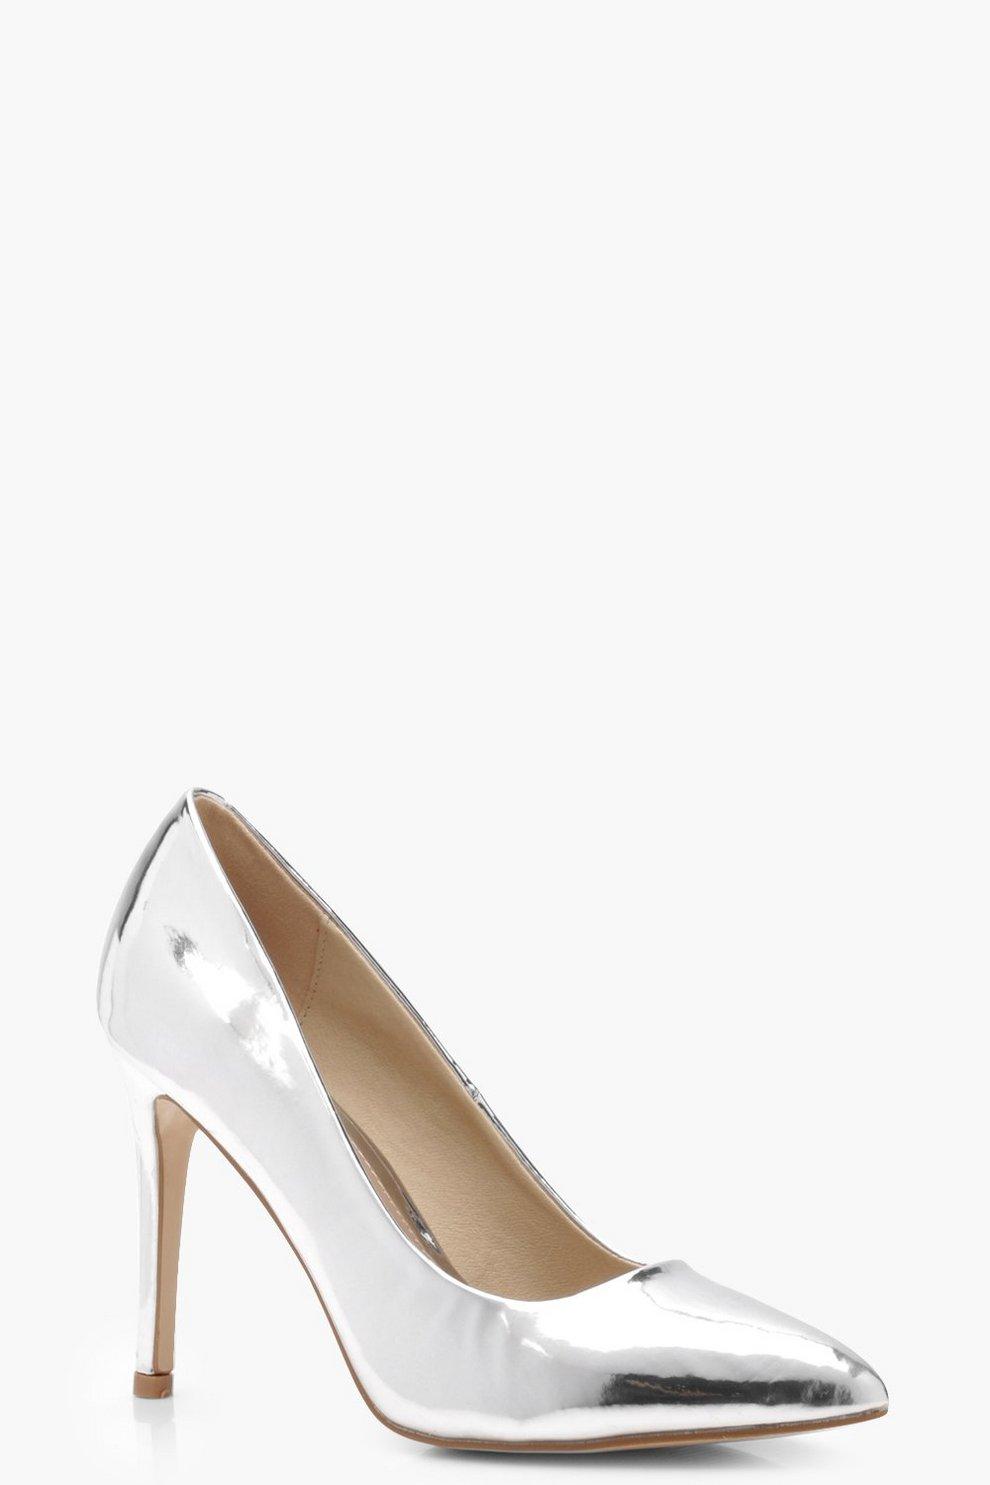 Zapatos beige de verano Boohoo para mujer F9uekndpNn